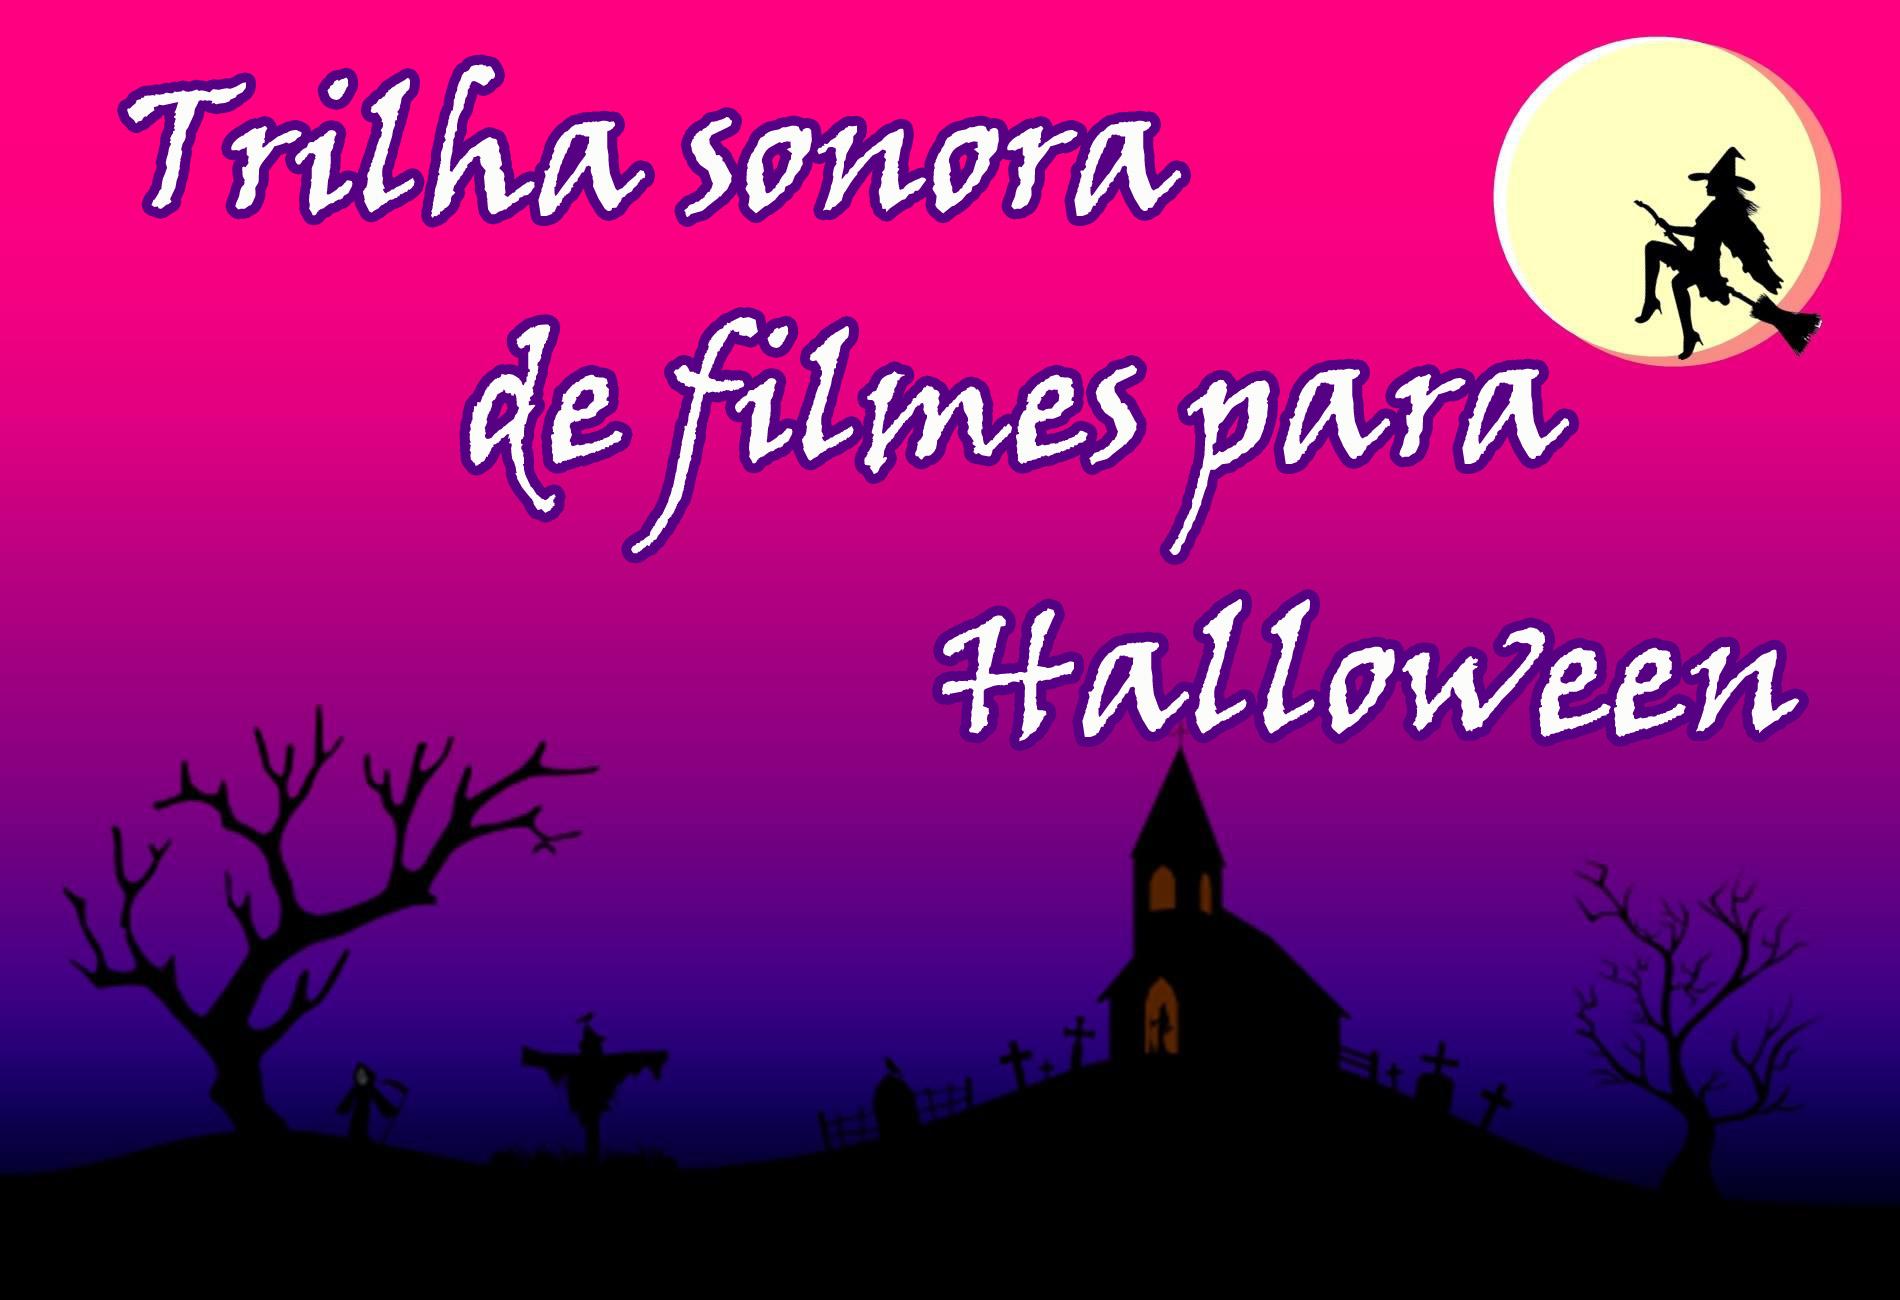 Trilha sonora de filmes para halloween